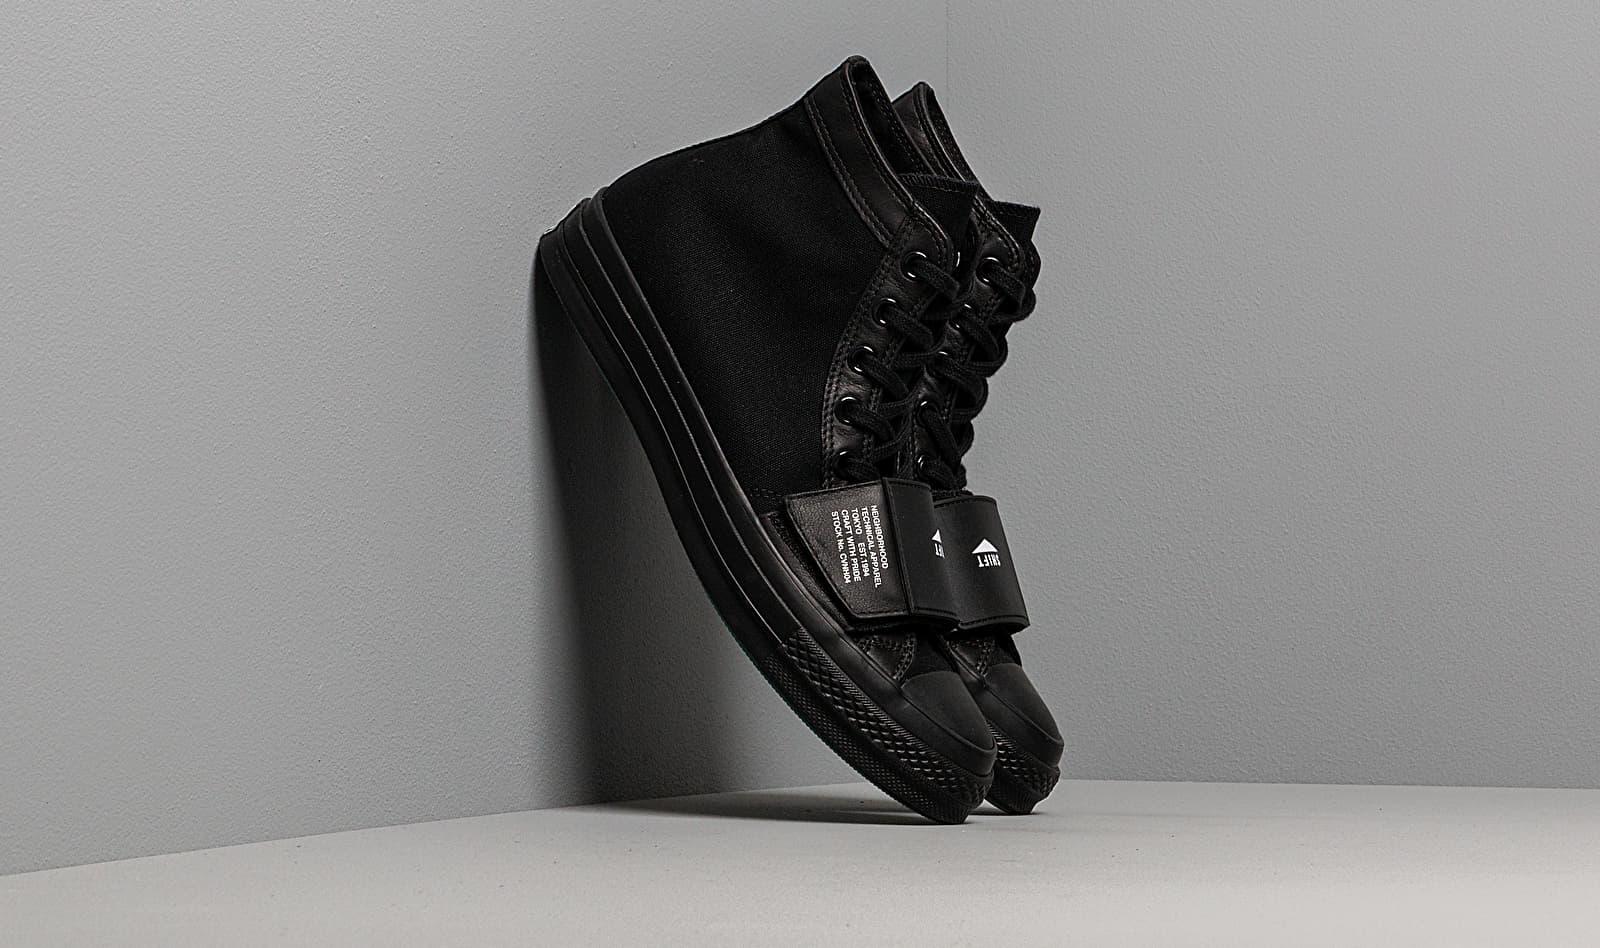 Converse x Neighborhood Chuck 70 Moto Black/ Black/ Black 165603C